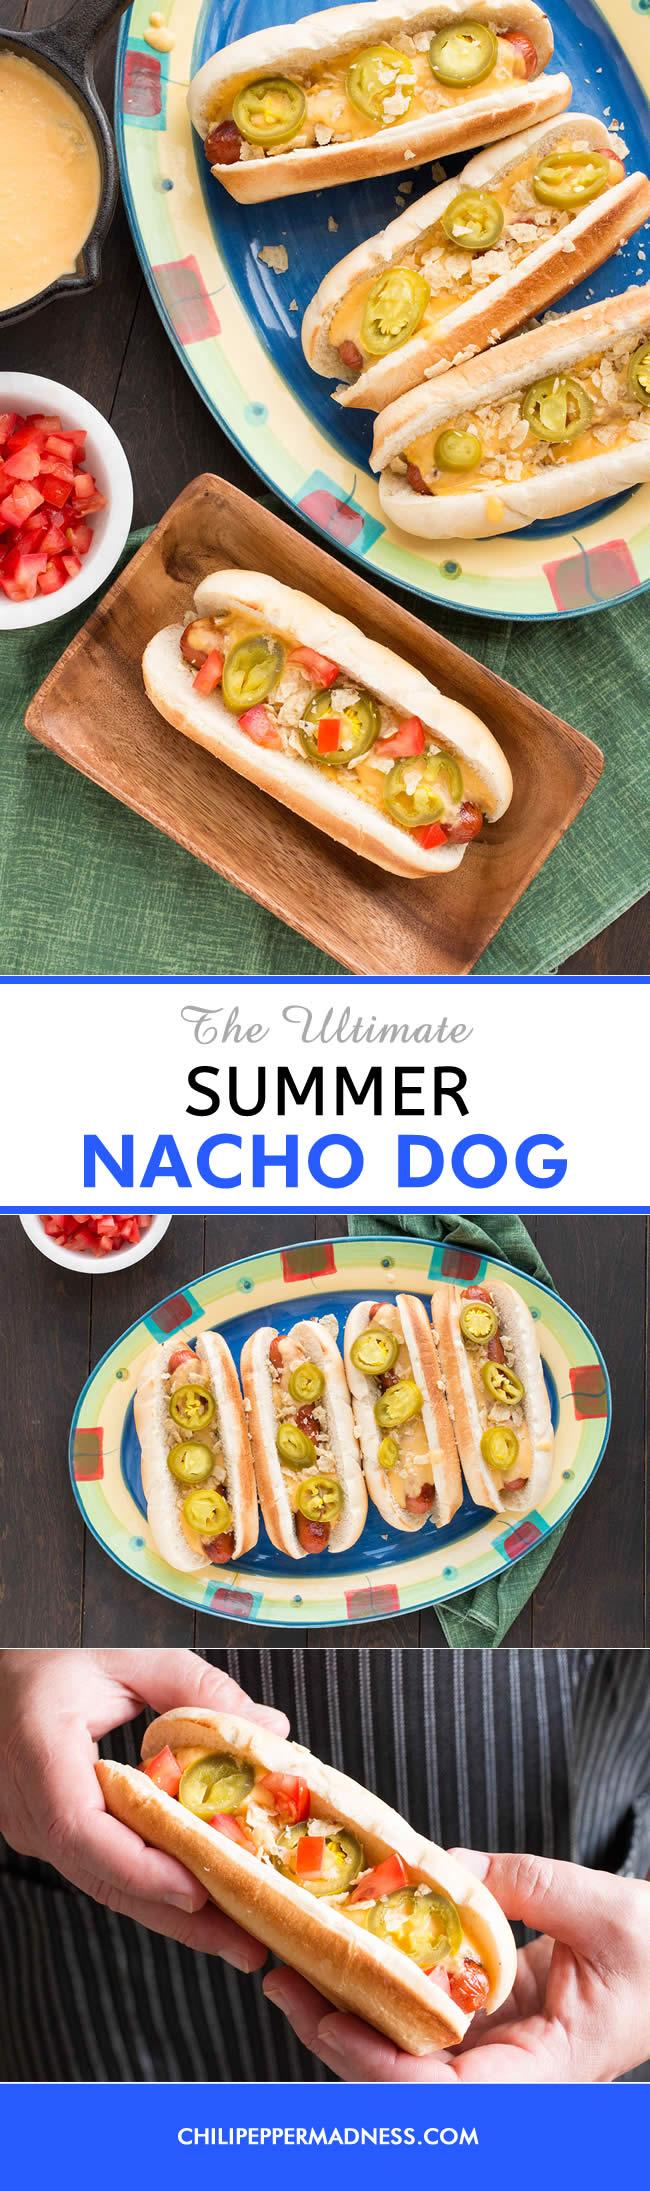 The Ultimate Summer Nacho Dog - Recipe